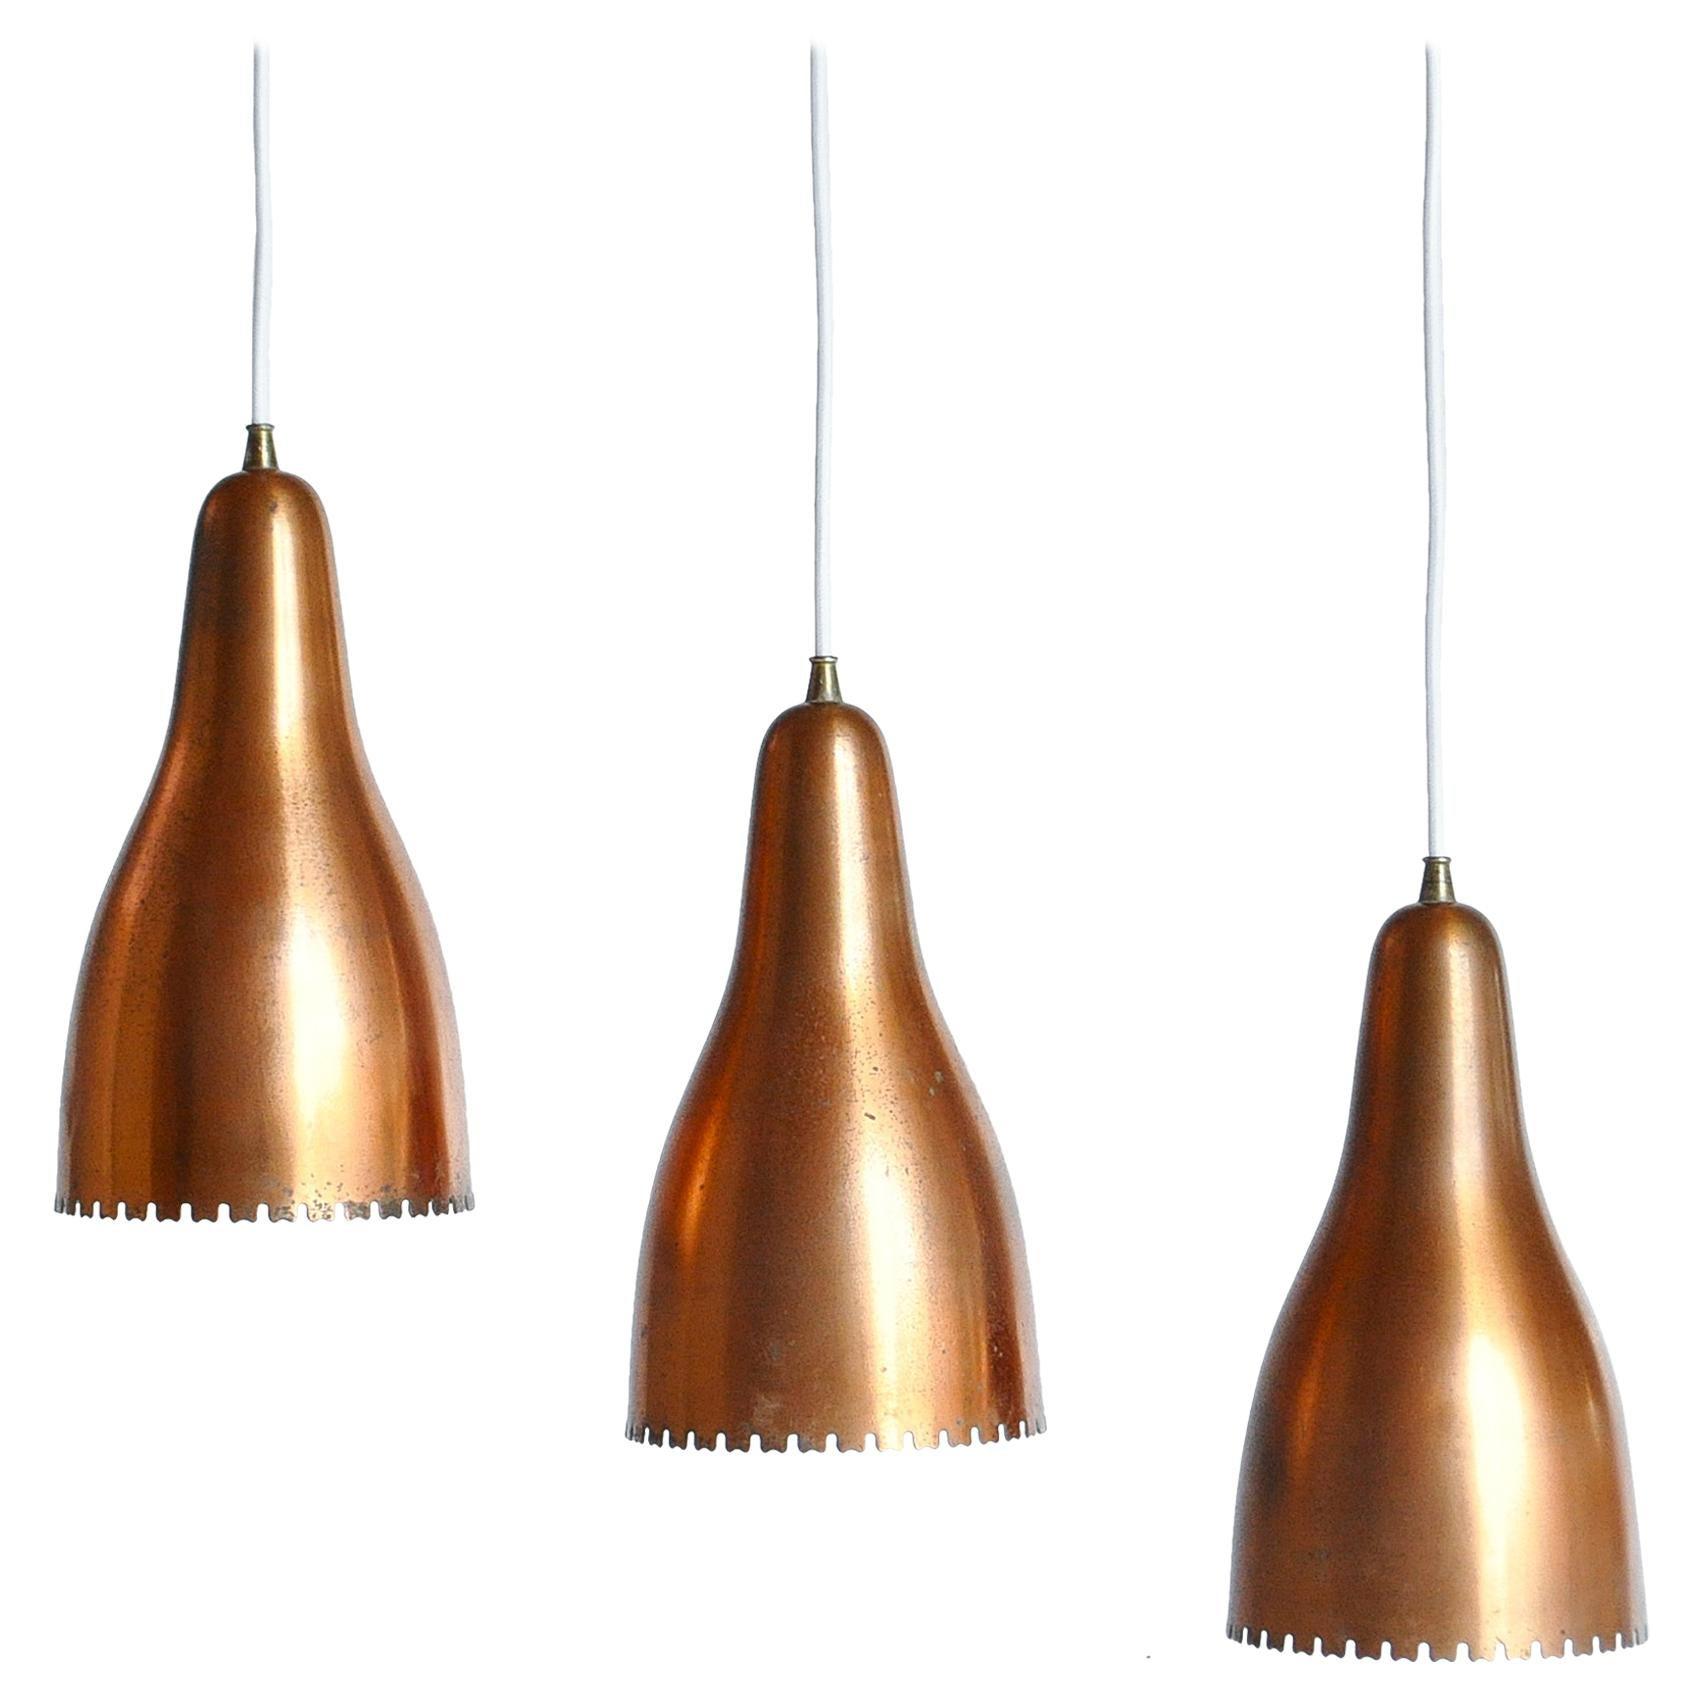 Set of 3 Copper Bell Ceiling Pendants by Bent Karlby, Lyfa, Copenhagen, 1960s